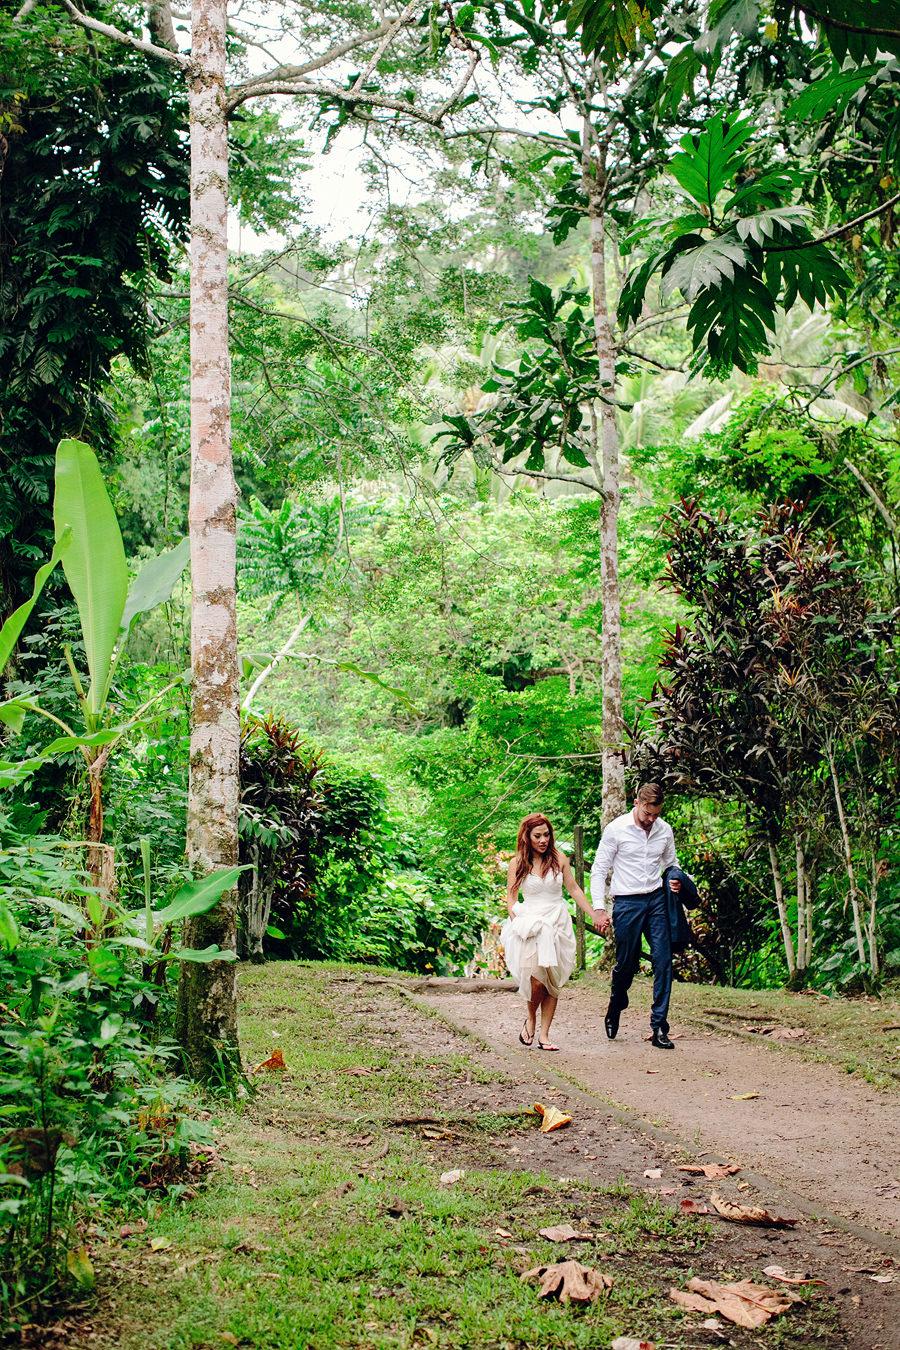 Mele Cascades Vanuatu Wedding Photographers: Bride & groom walking through forest